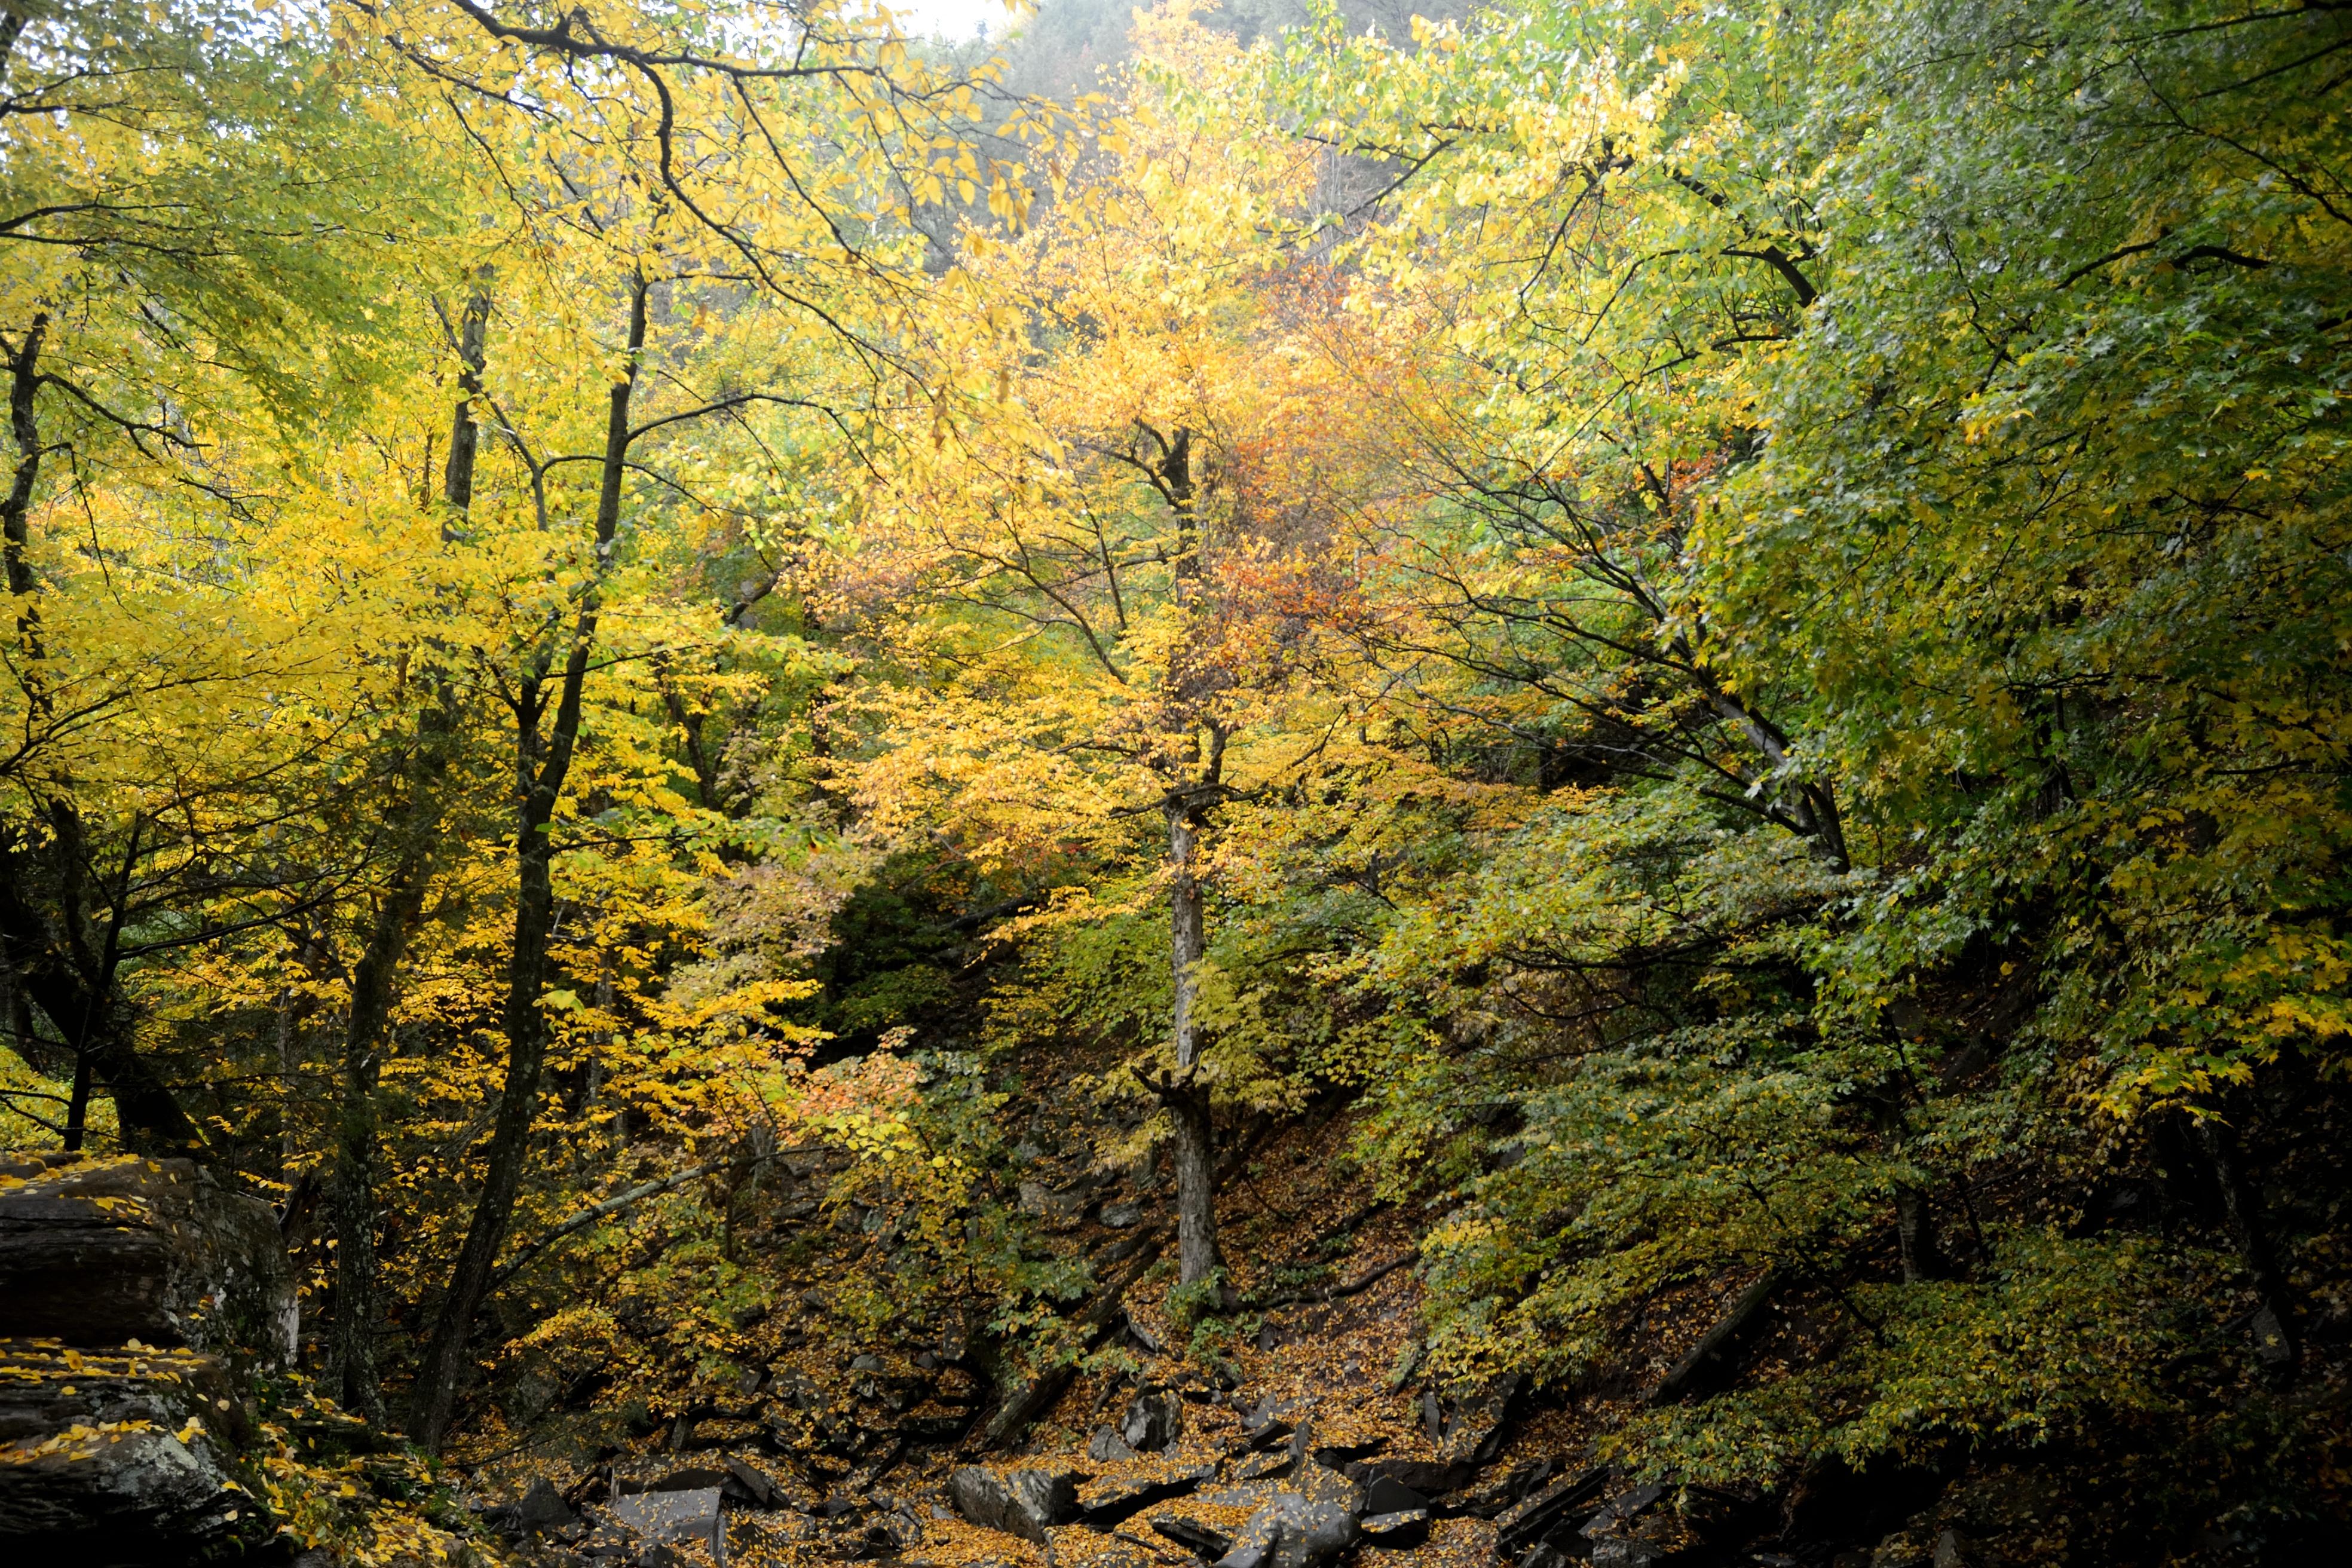 Fall Foliage in Kaaterskill Clove